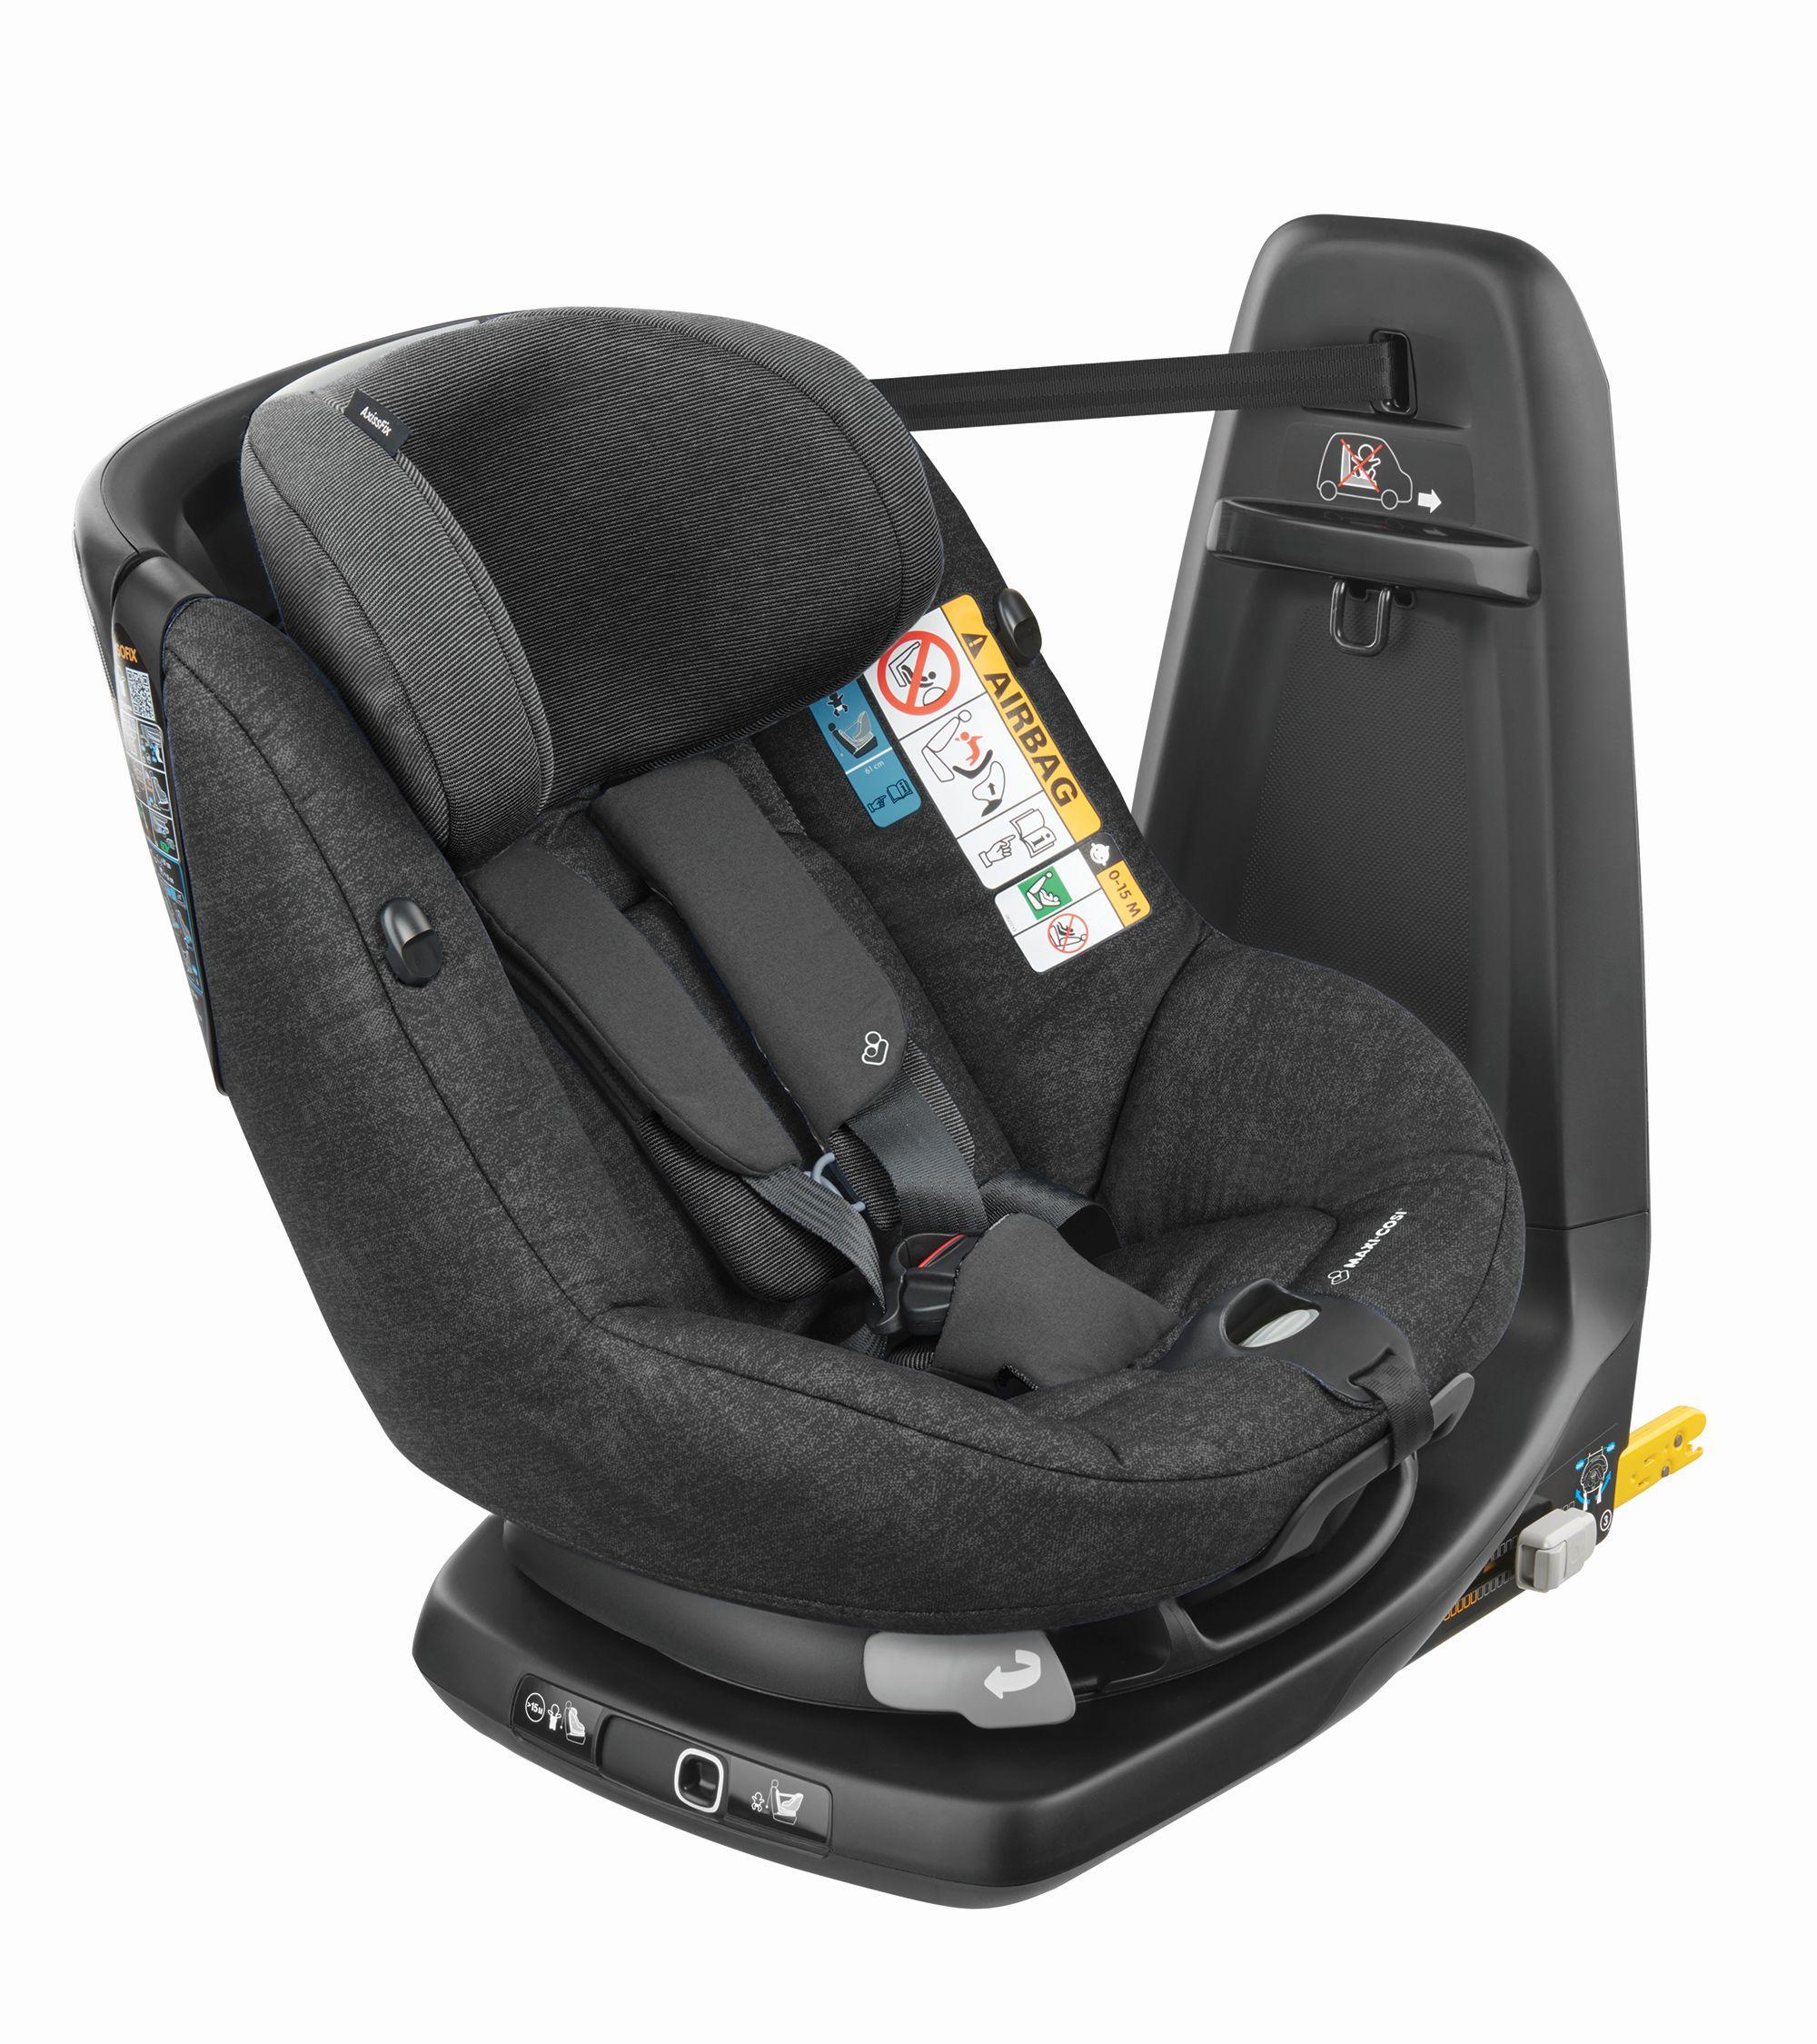 Sweet Baby Soft Maxi Seat Insert with Removable Headrest//Newborn Insert